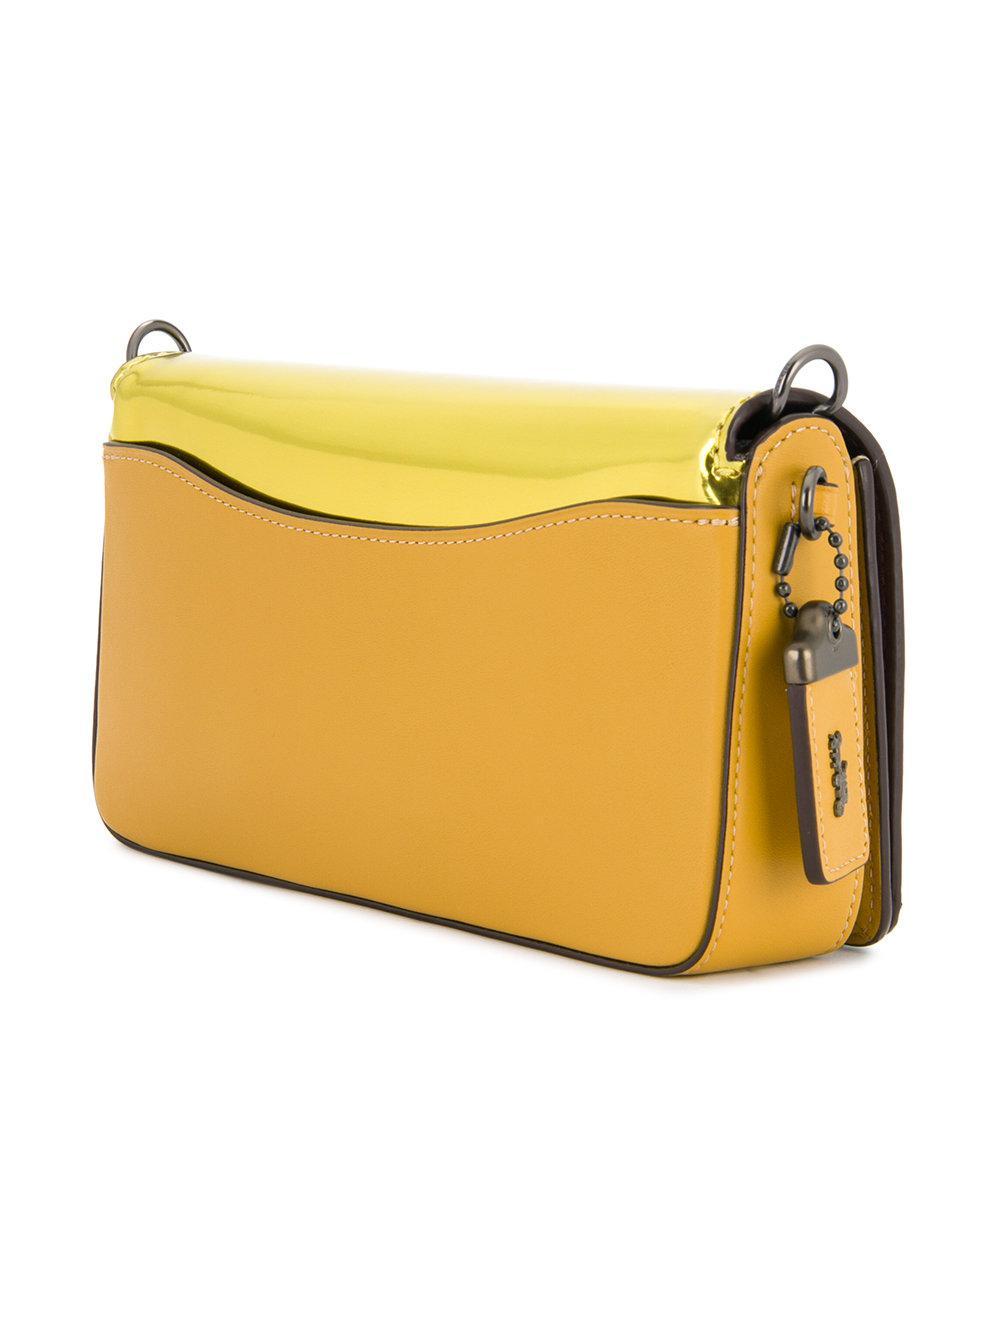 COACH Leather Dinky Crossbody Bag in Yellow & Orange (Yellow)